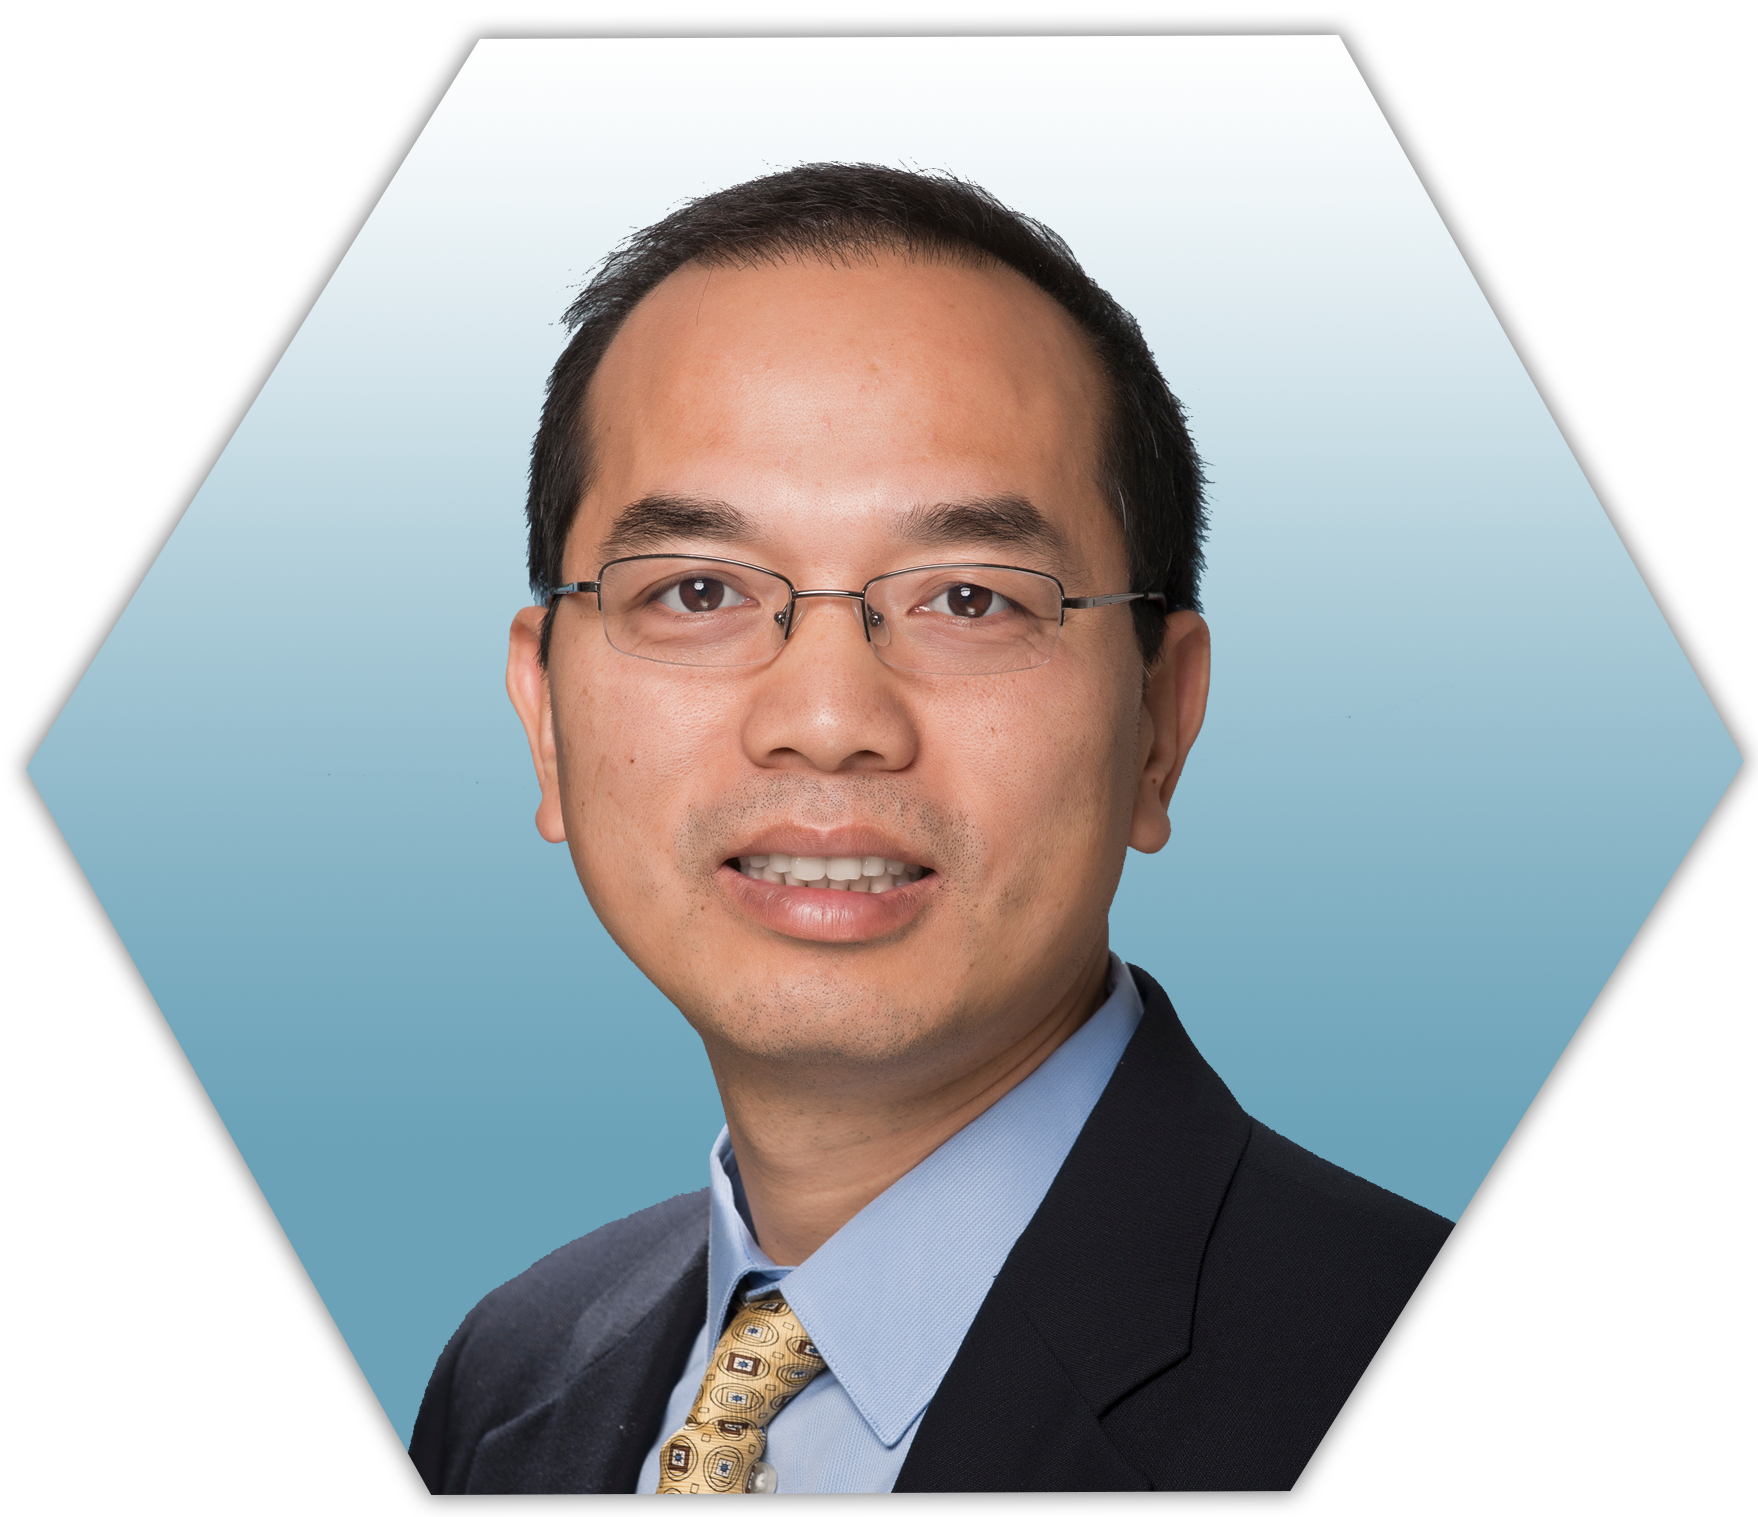 Guanghui%20Hu,%20PhD,%20Chief%20Executive%20Officer Leadership Team